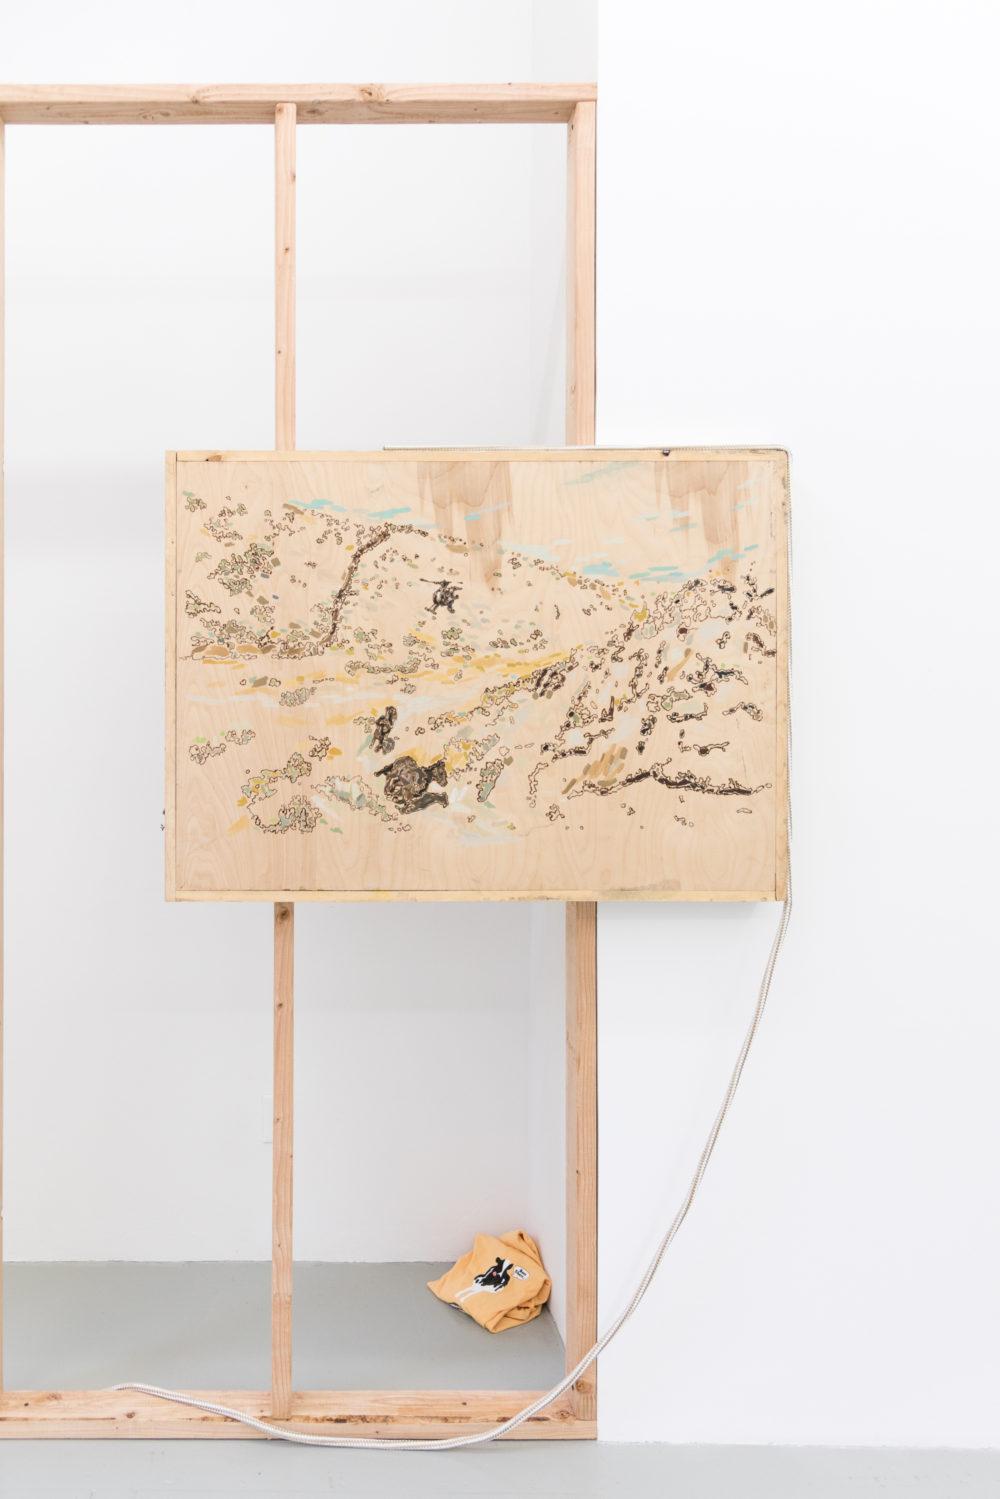 Rebecca Peel Present-day Arizona, 2016 Wood, gouache, galvanized steel, polyester rope